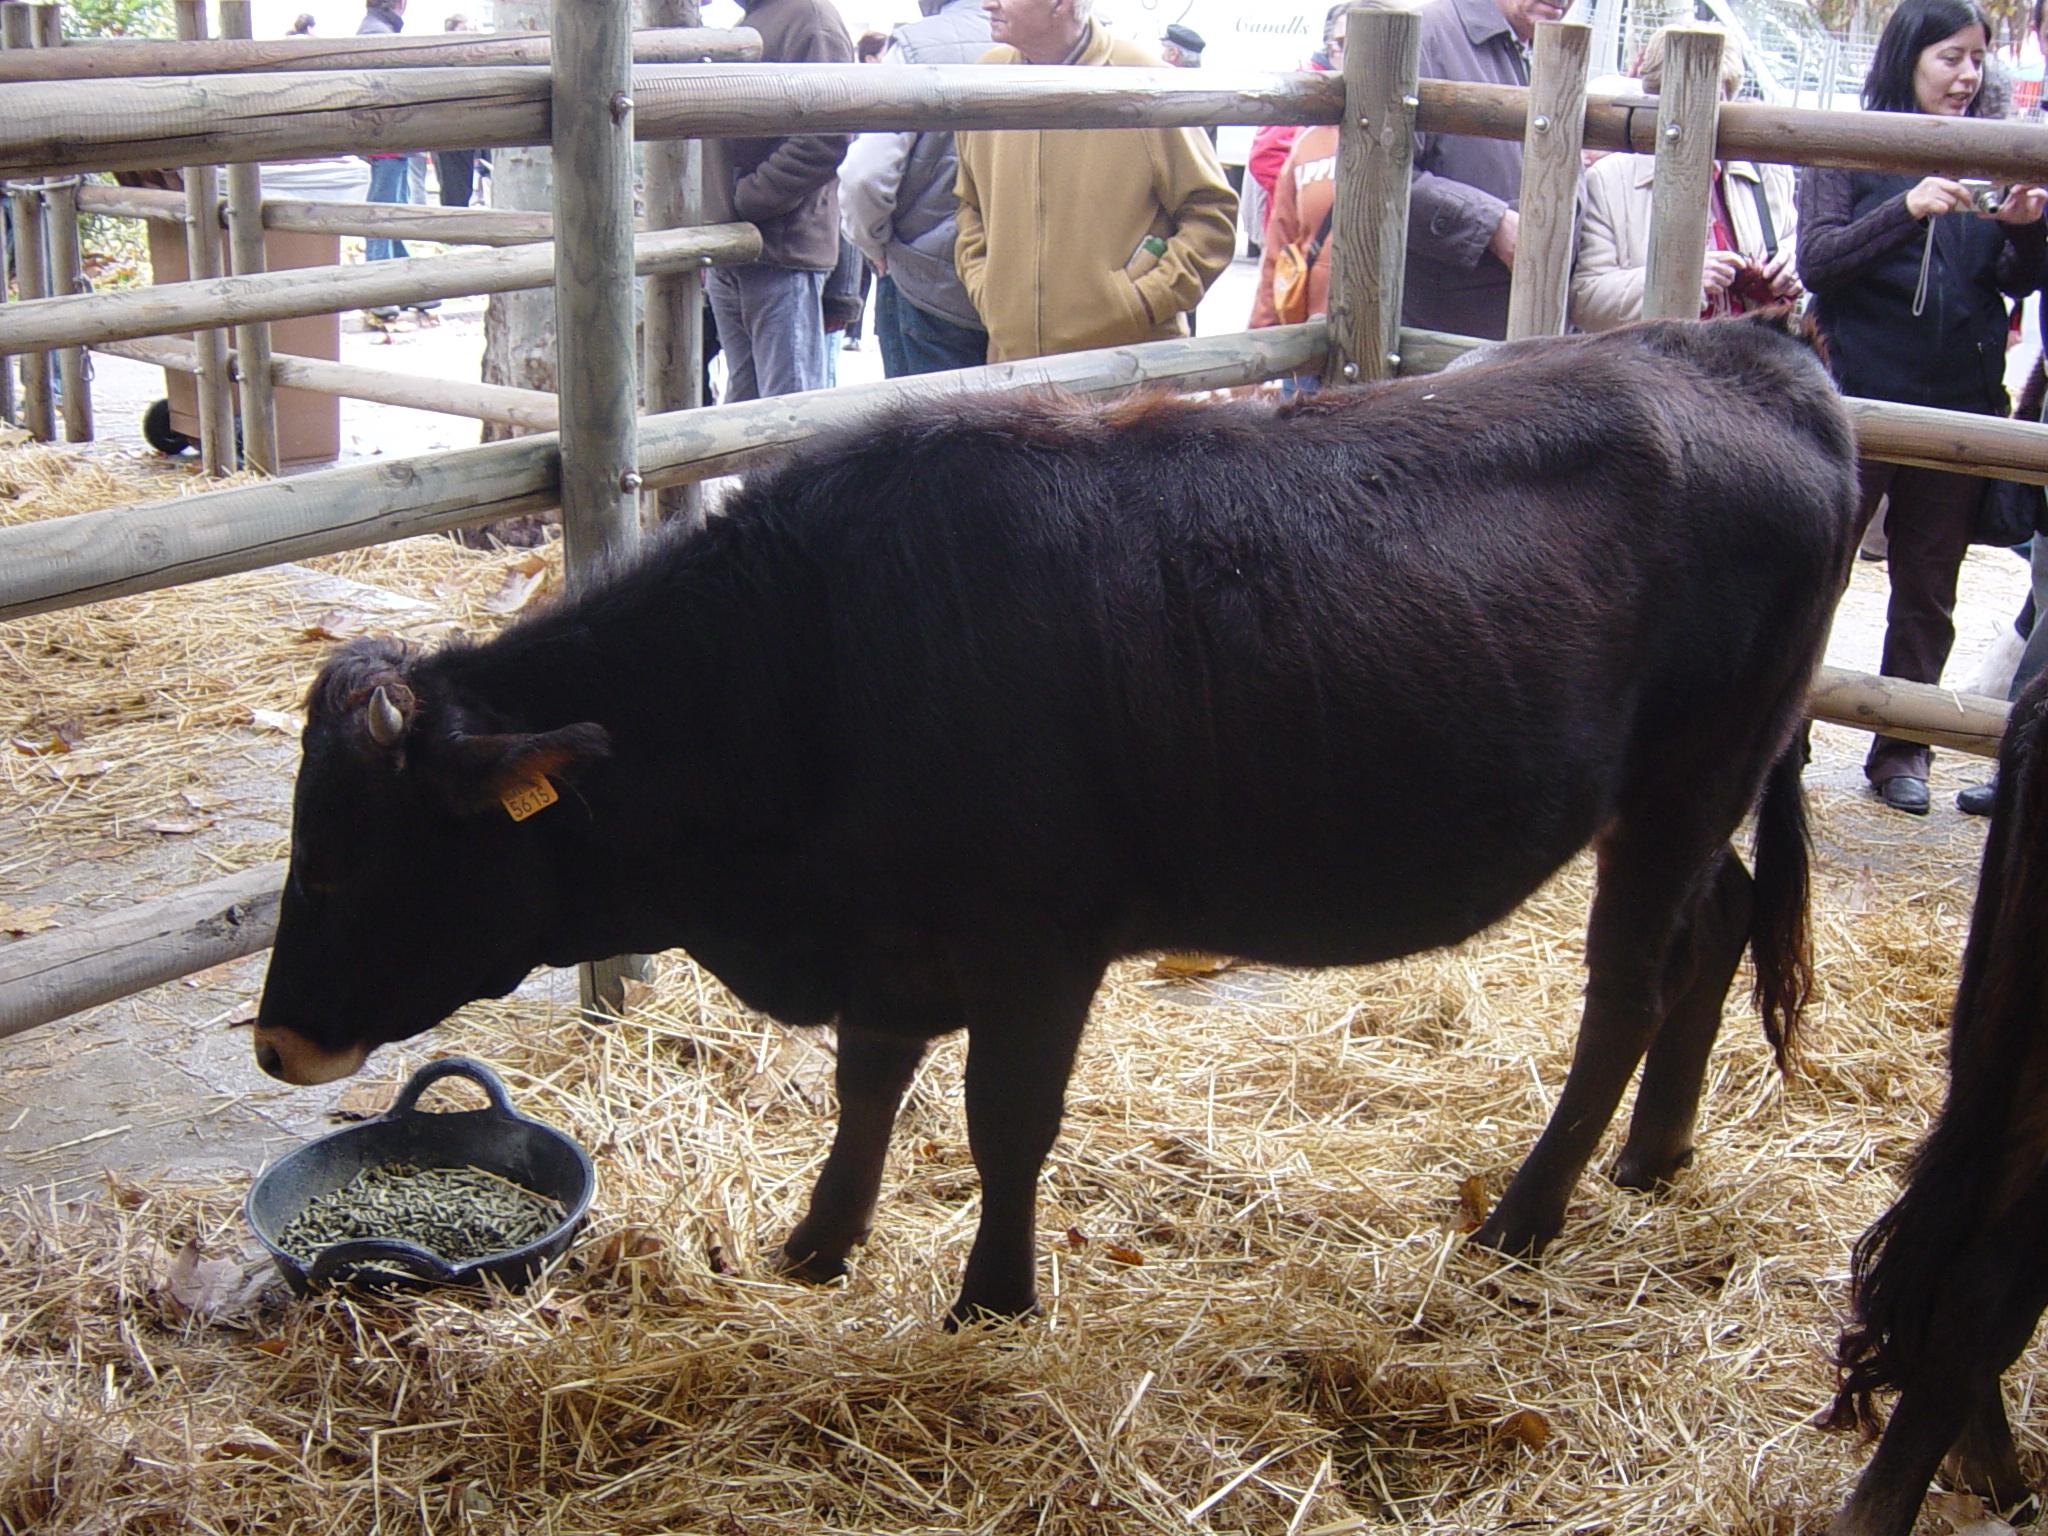 File:Vaca mallorquina.JPG - Wikimedia Commons